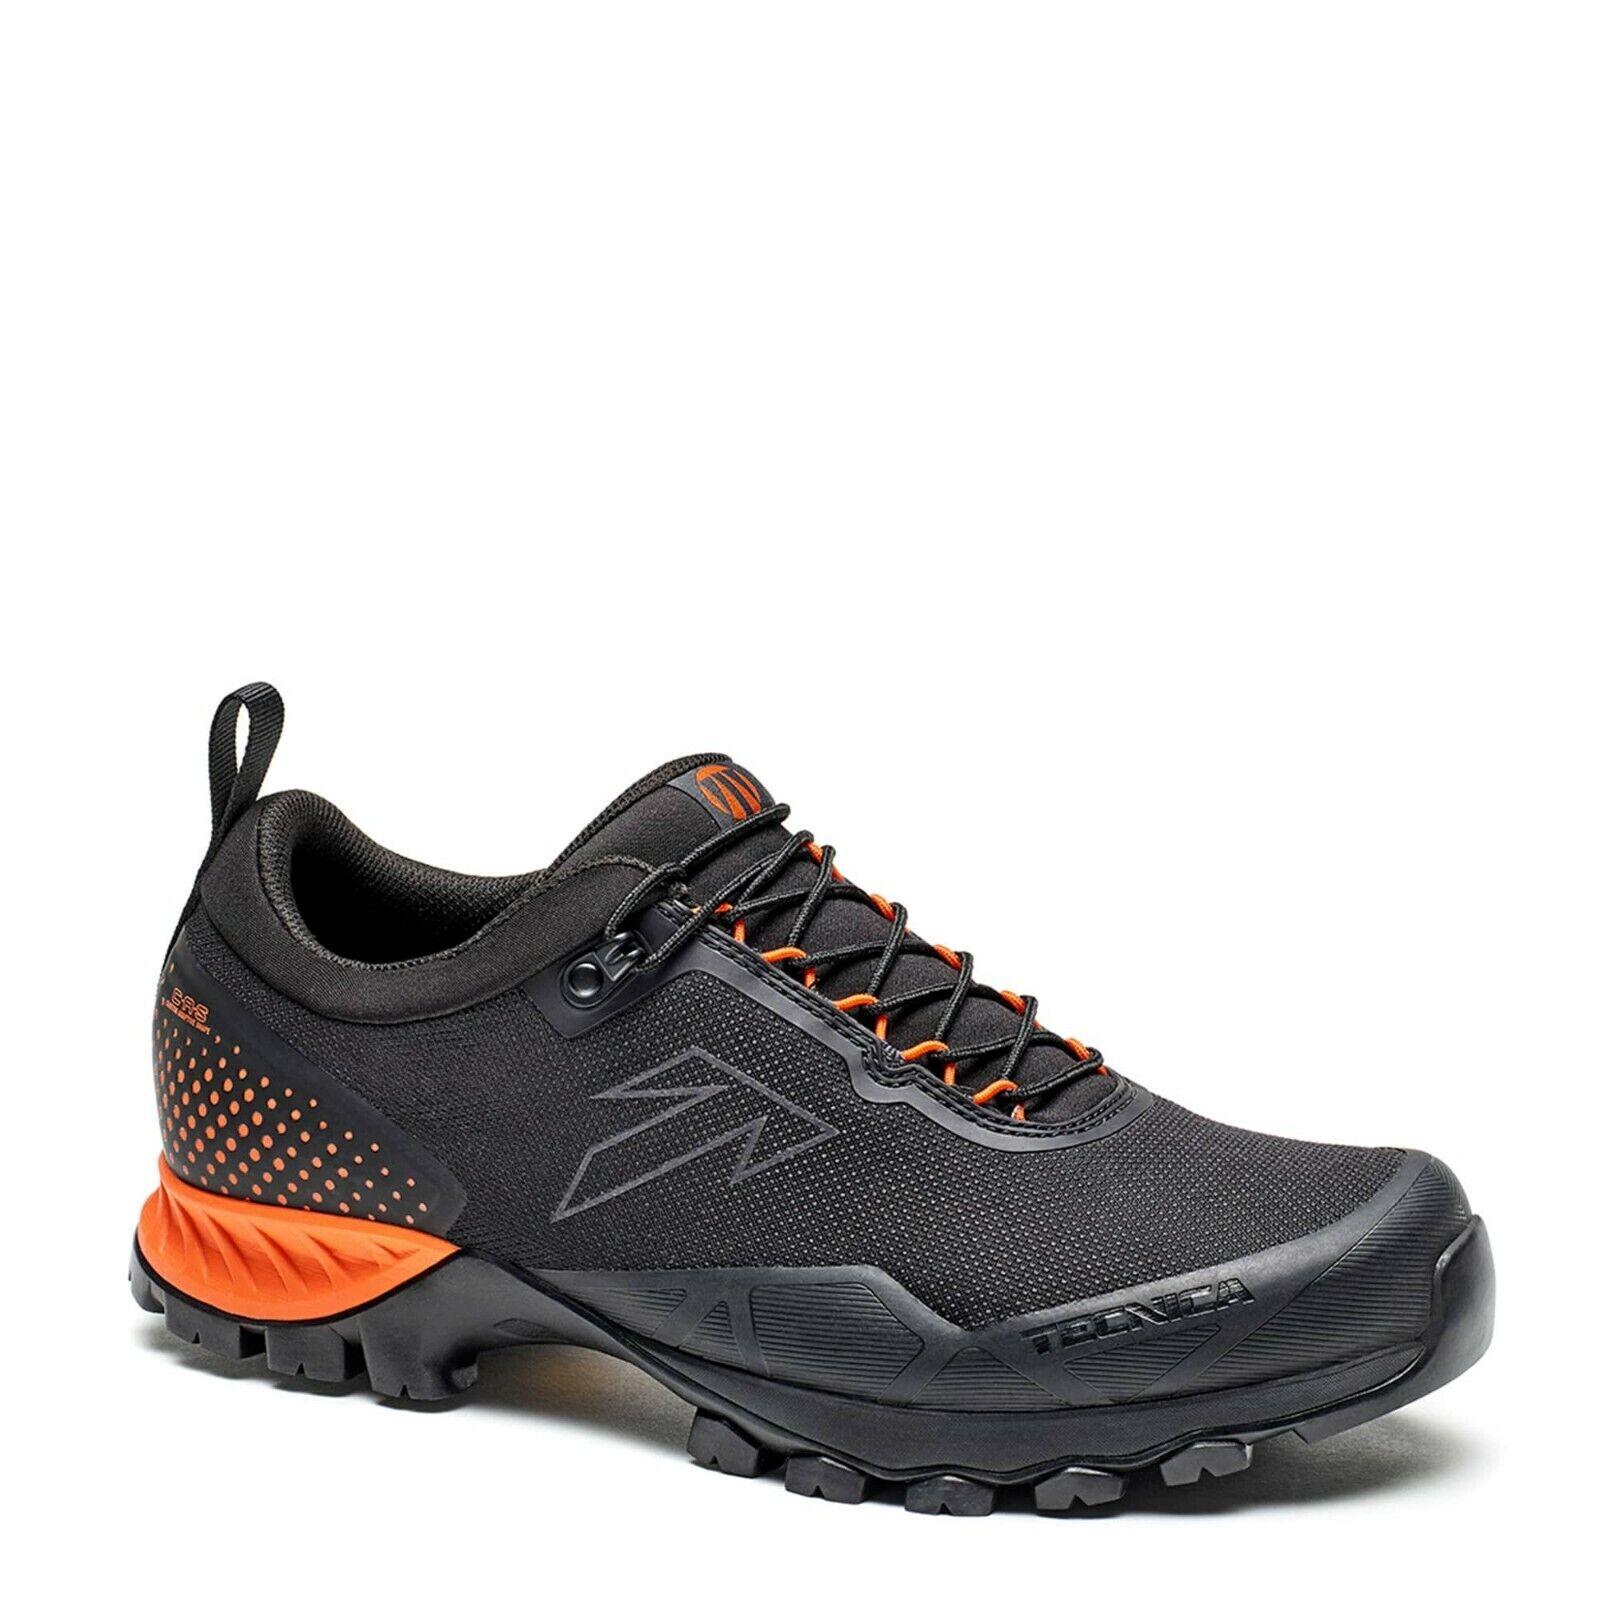 Schuhe Trekking Wandern Tecnica Plasma S Ms Schwarz Dusty Lava